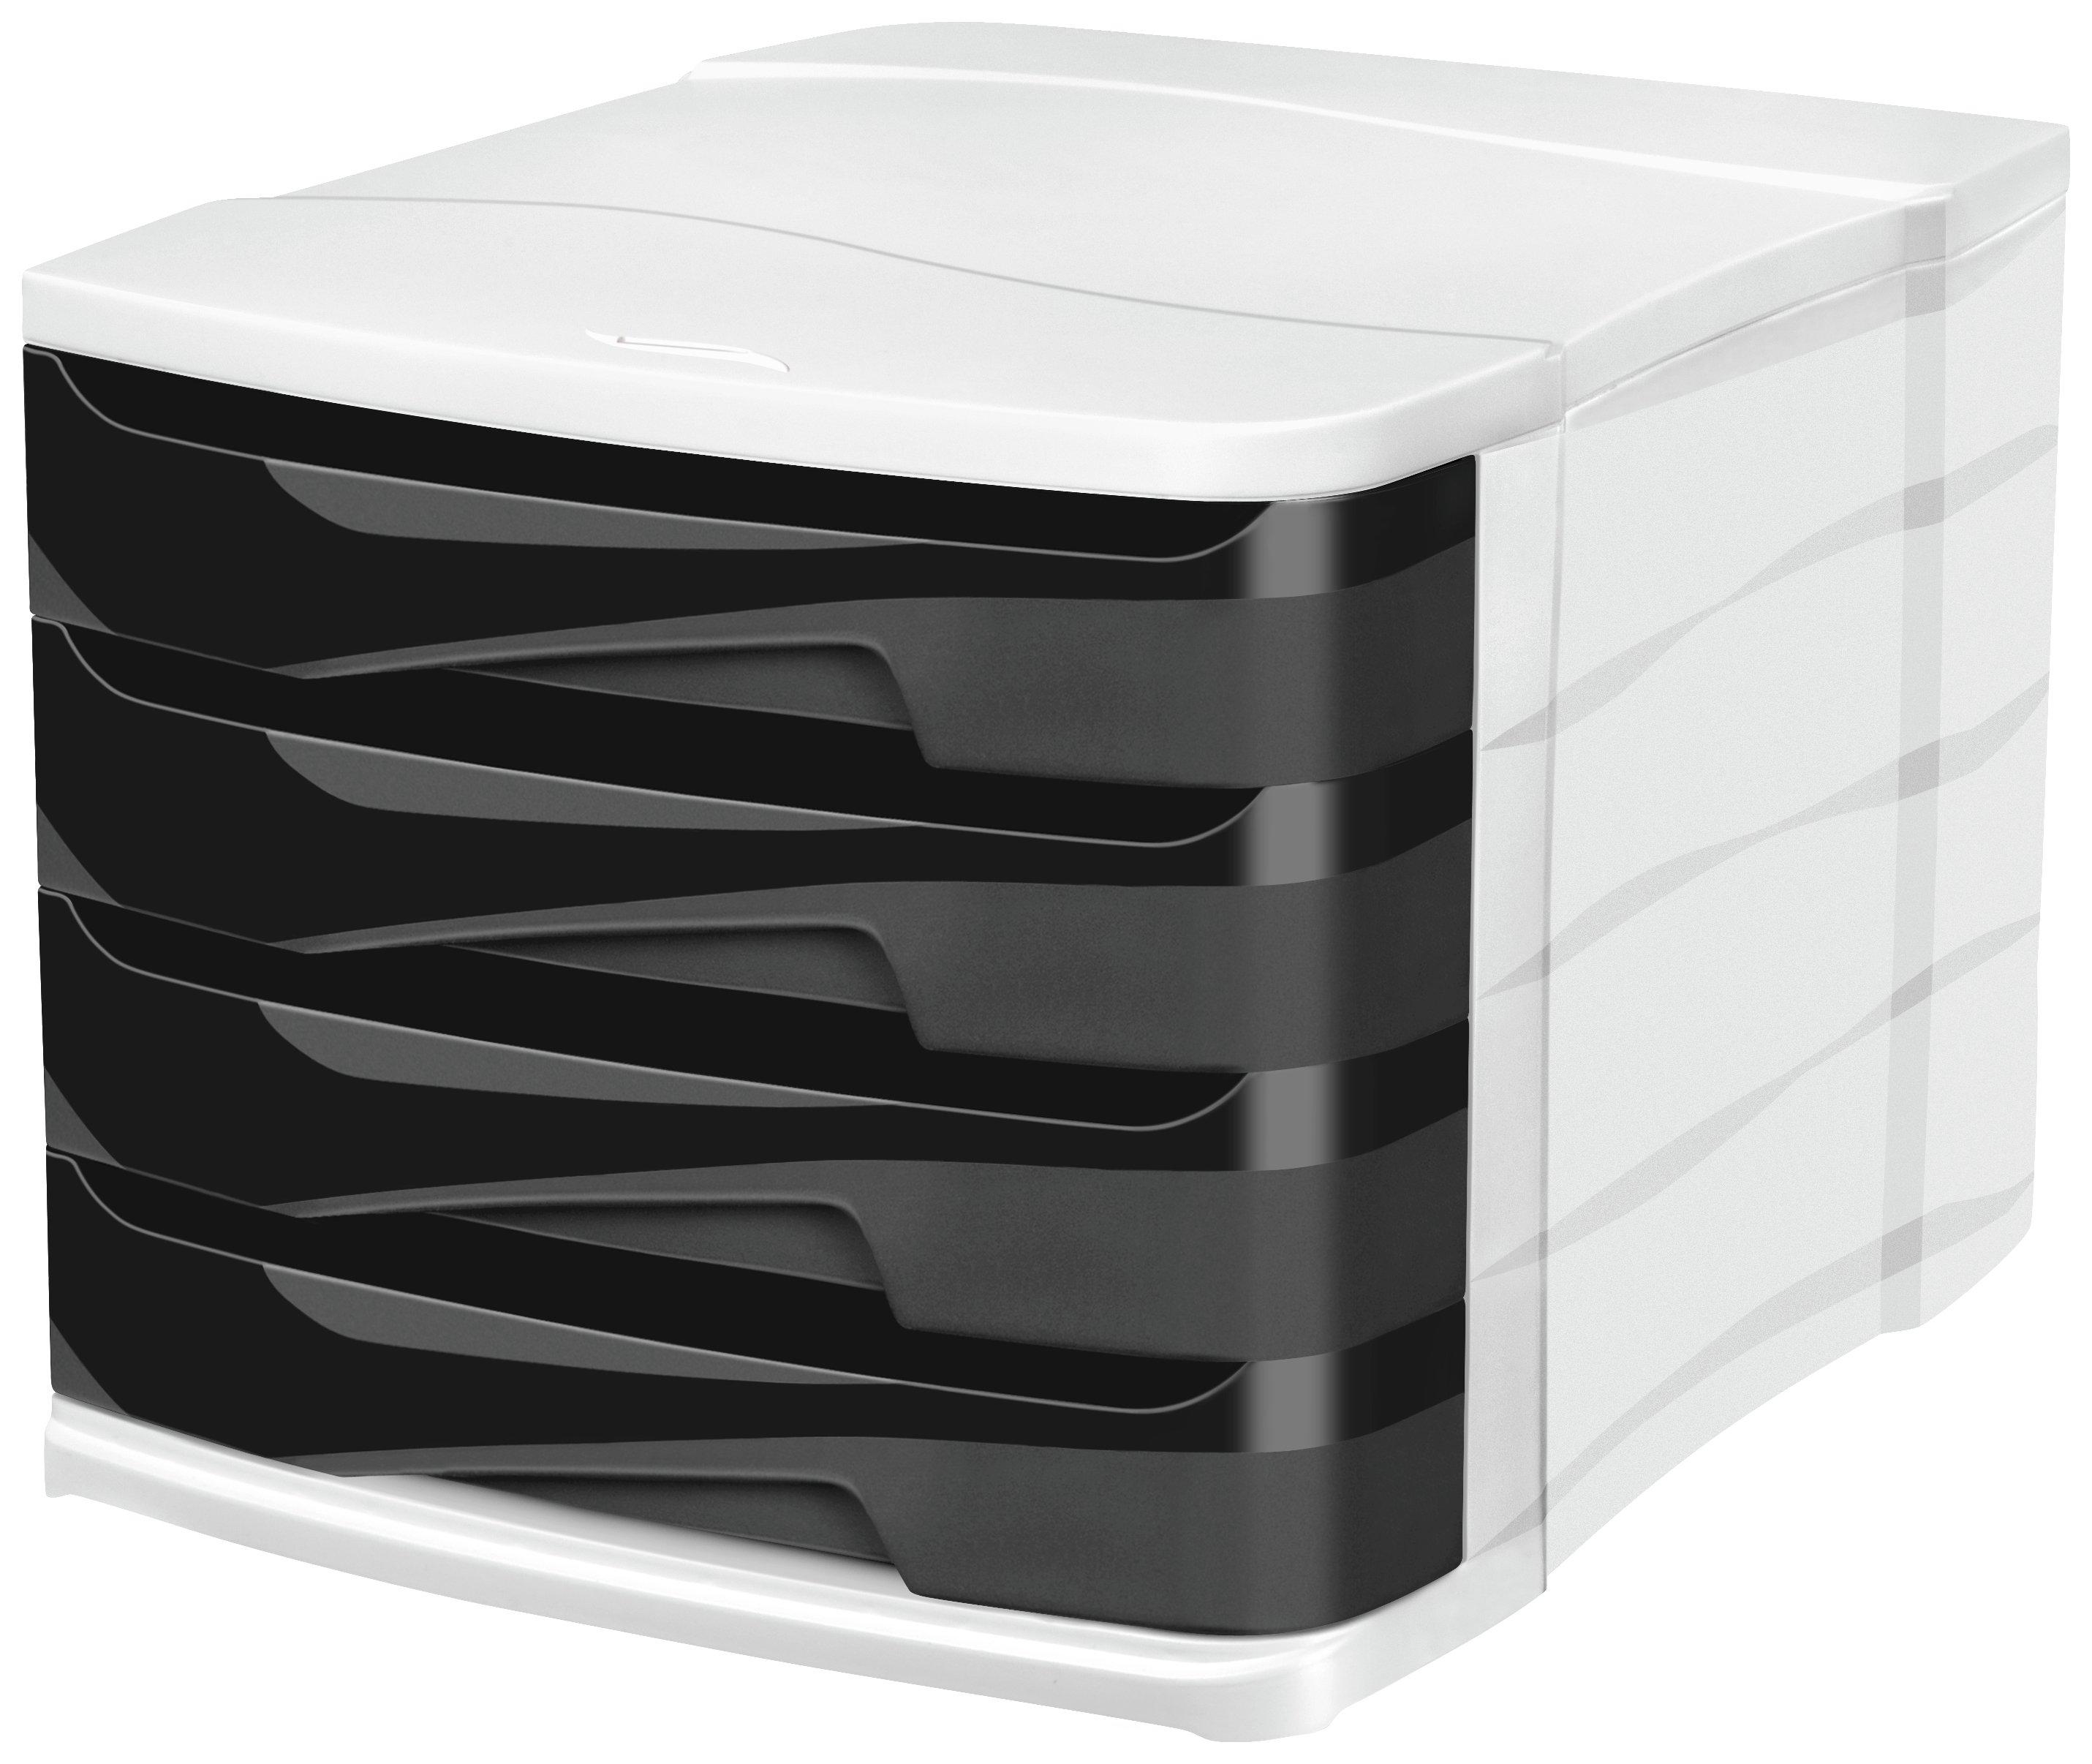 Image of CEP 4 Drawer - Desktop Module - Black